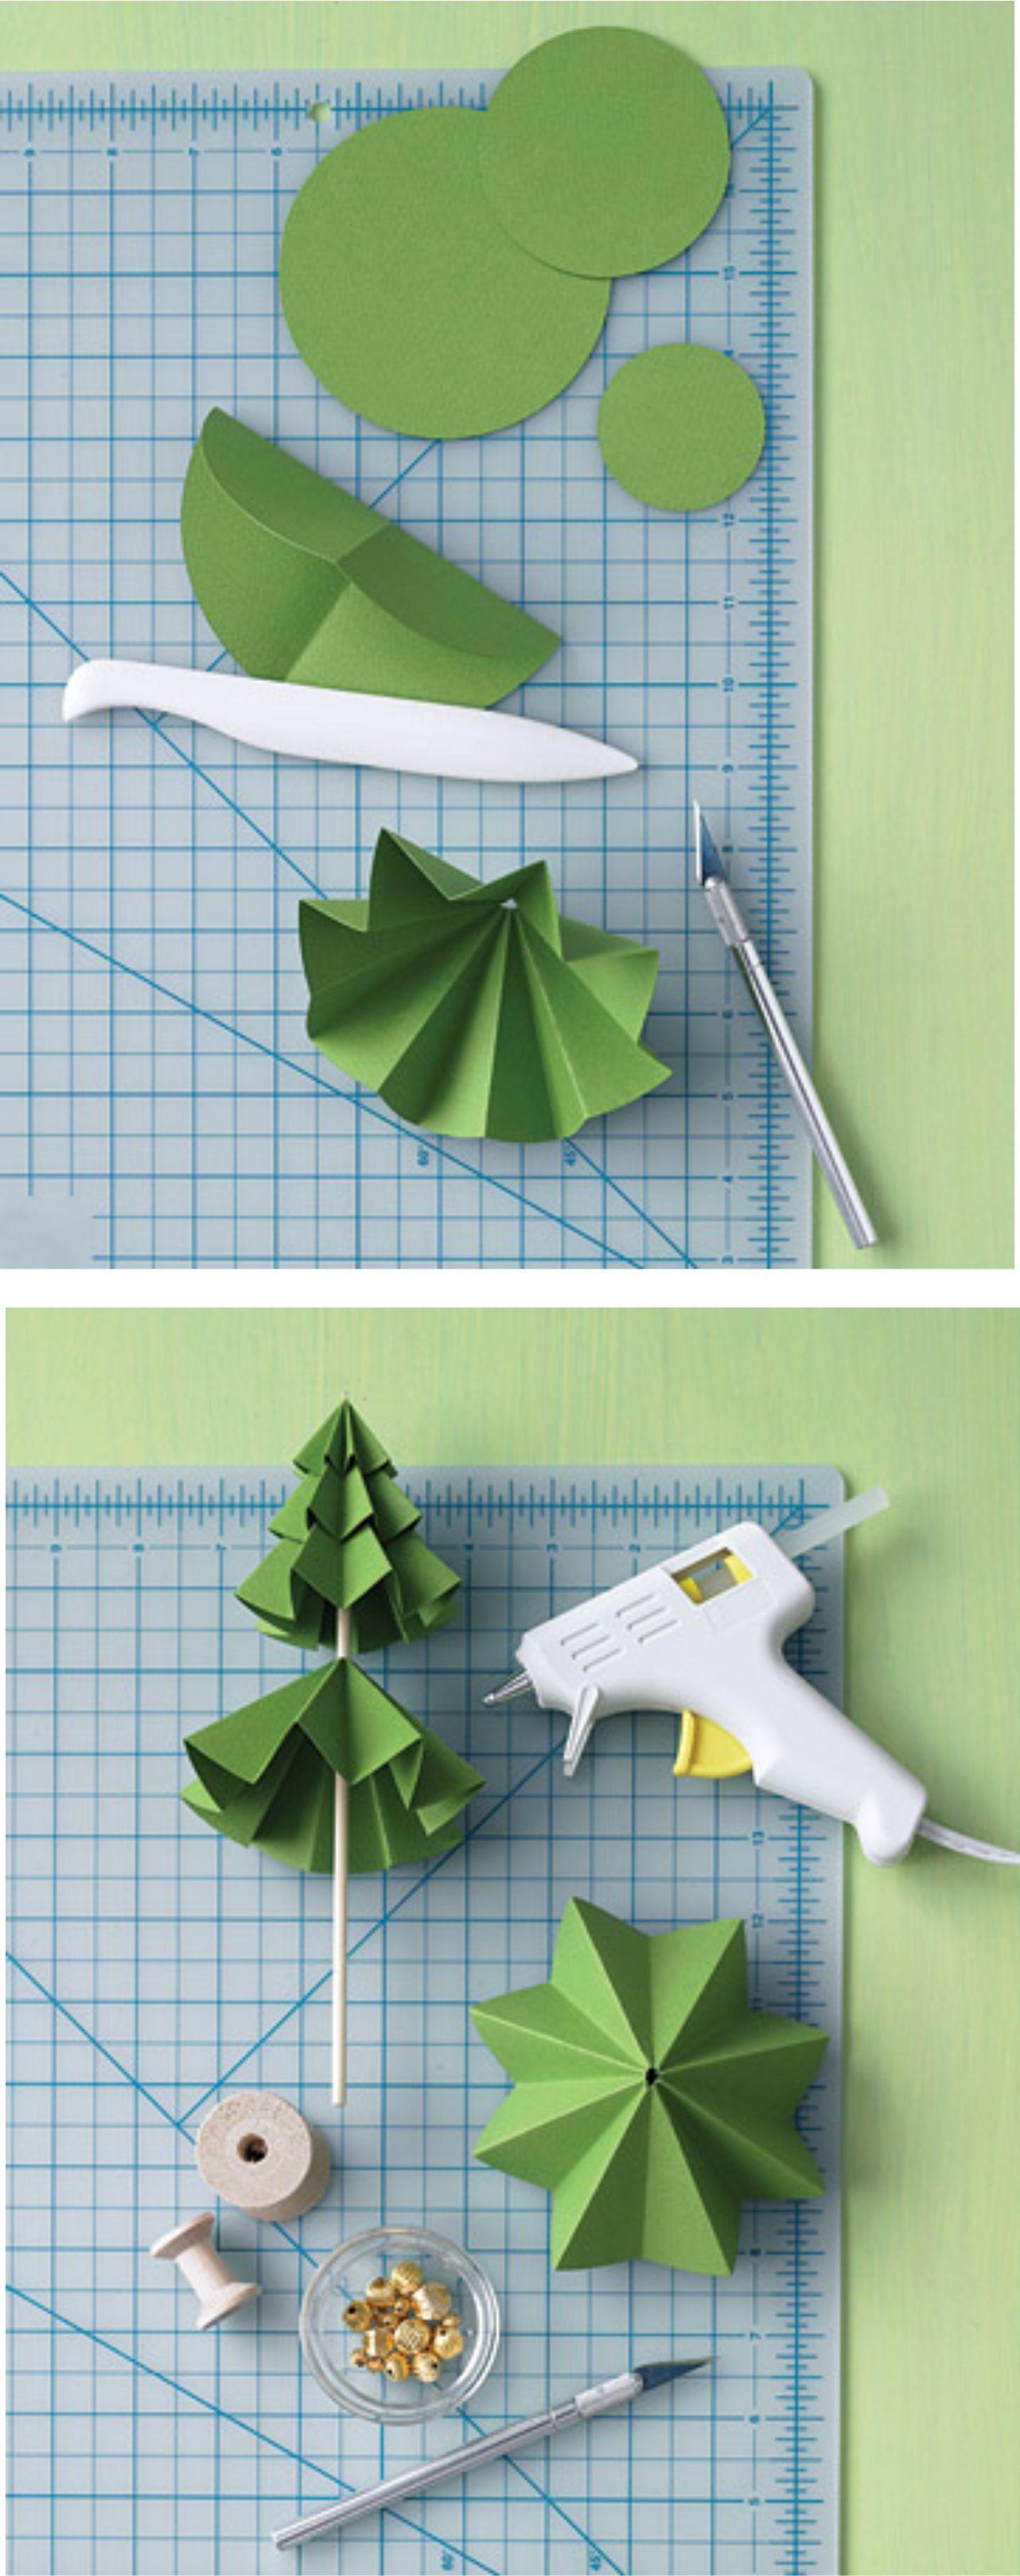 Arbolitos de navidad paso a paso manualidades arbol for Adornos navidenos origami paso a paso